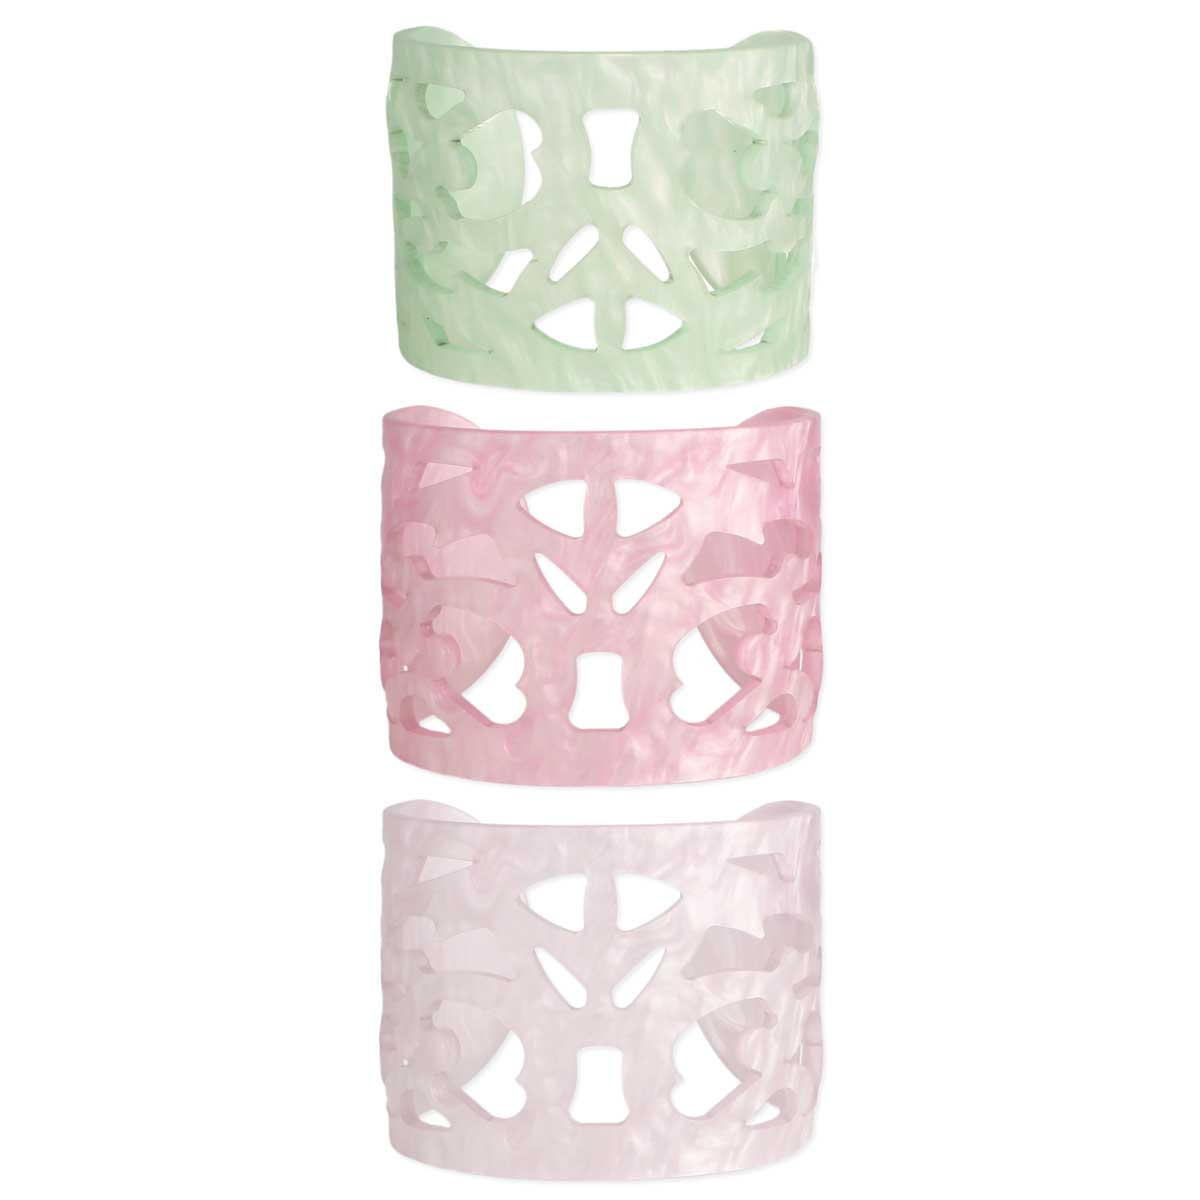 Pastel Resin Cutout Cuff Bracelet